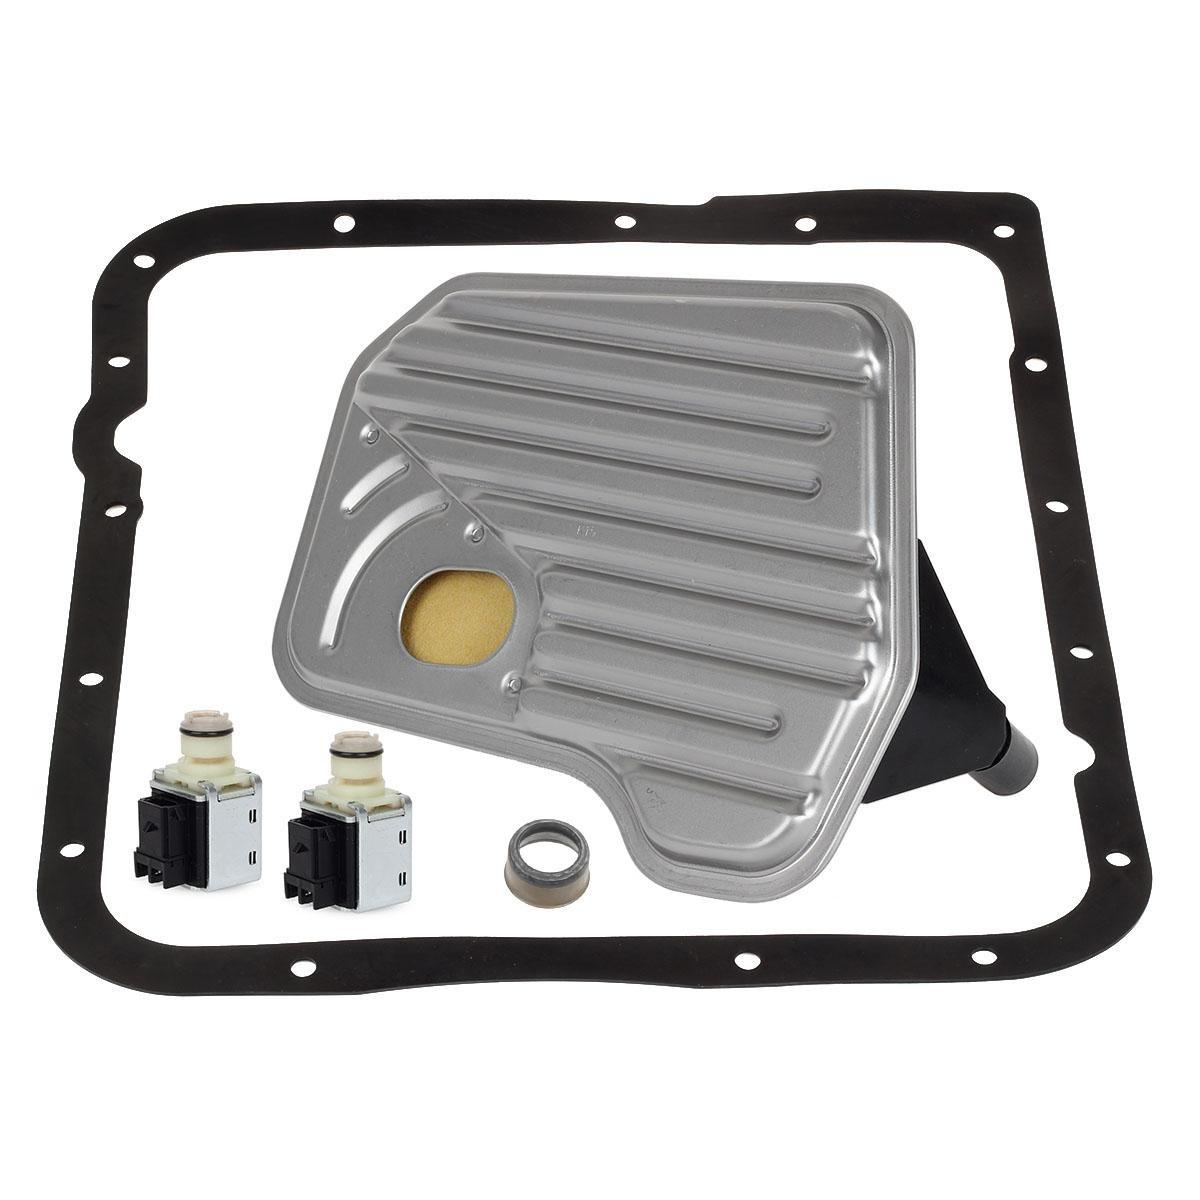 Partsam Transmission Shift A&B Solenoid Filter Kit Compatible With Chevrolet 4L60E 1993-1997